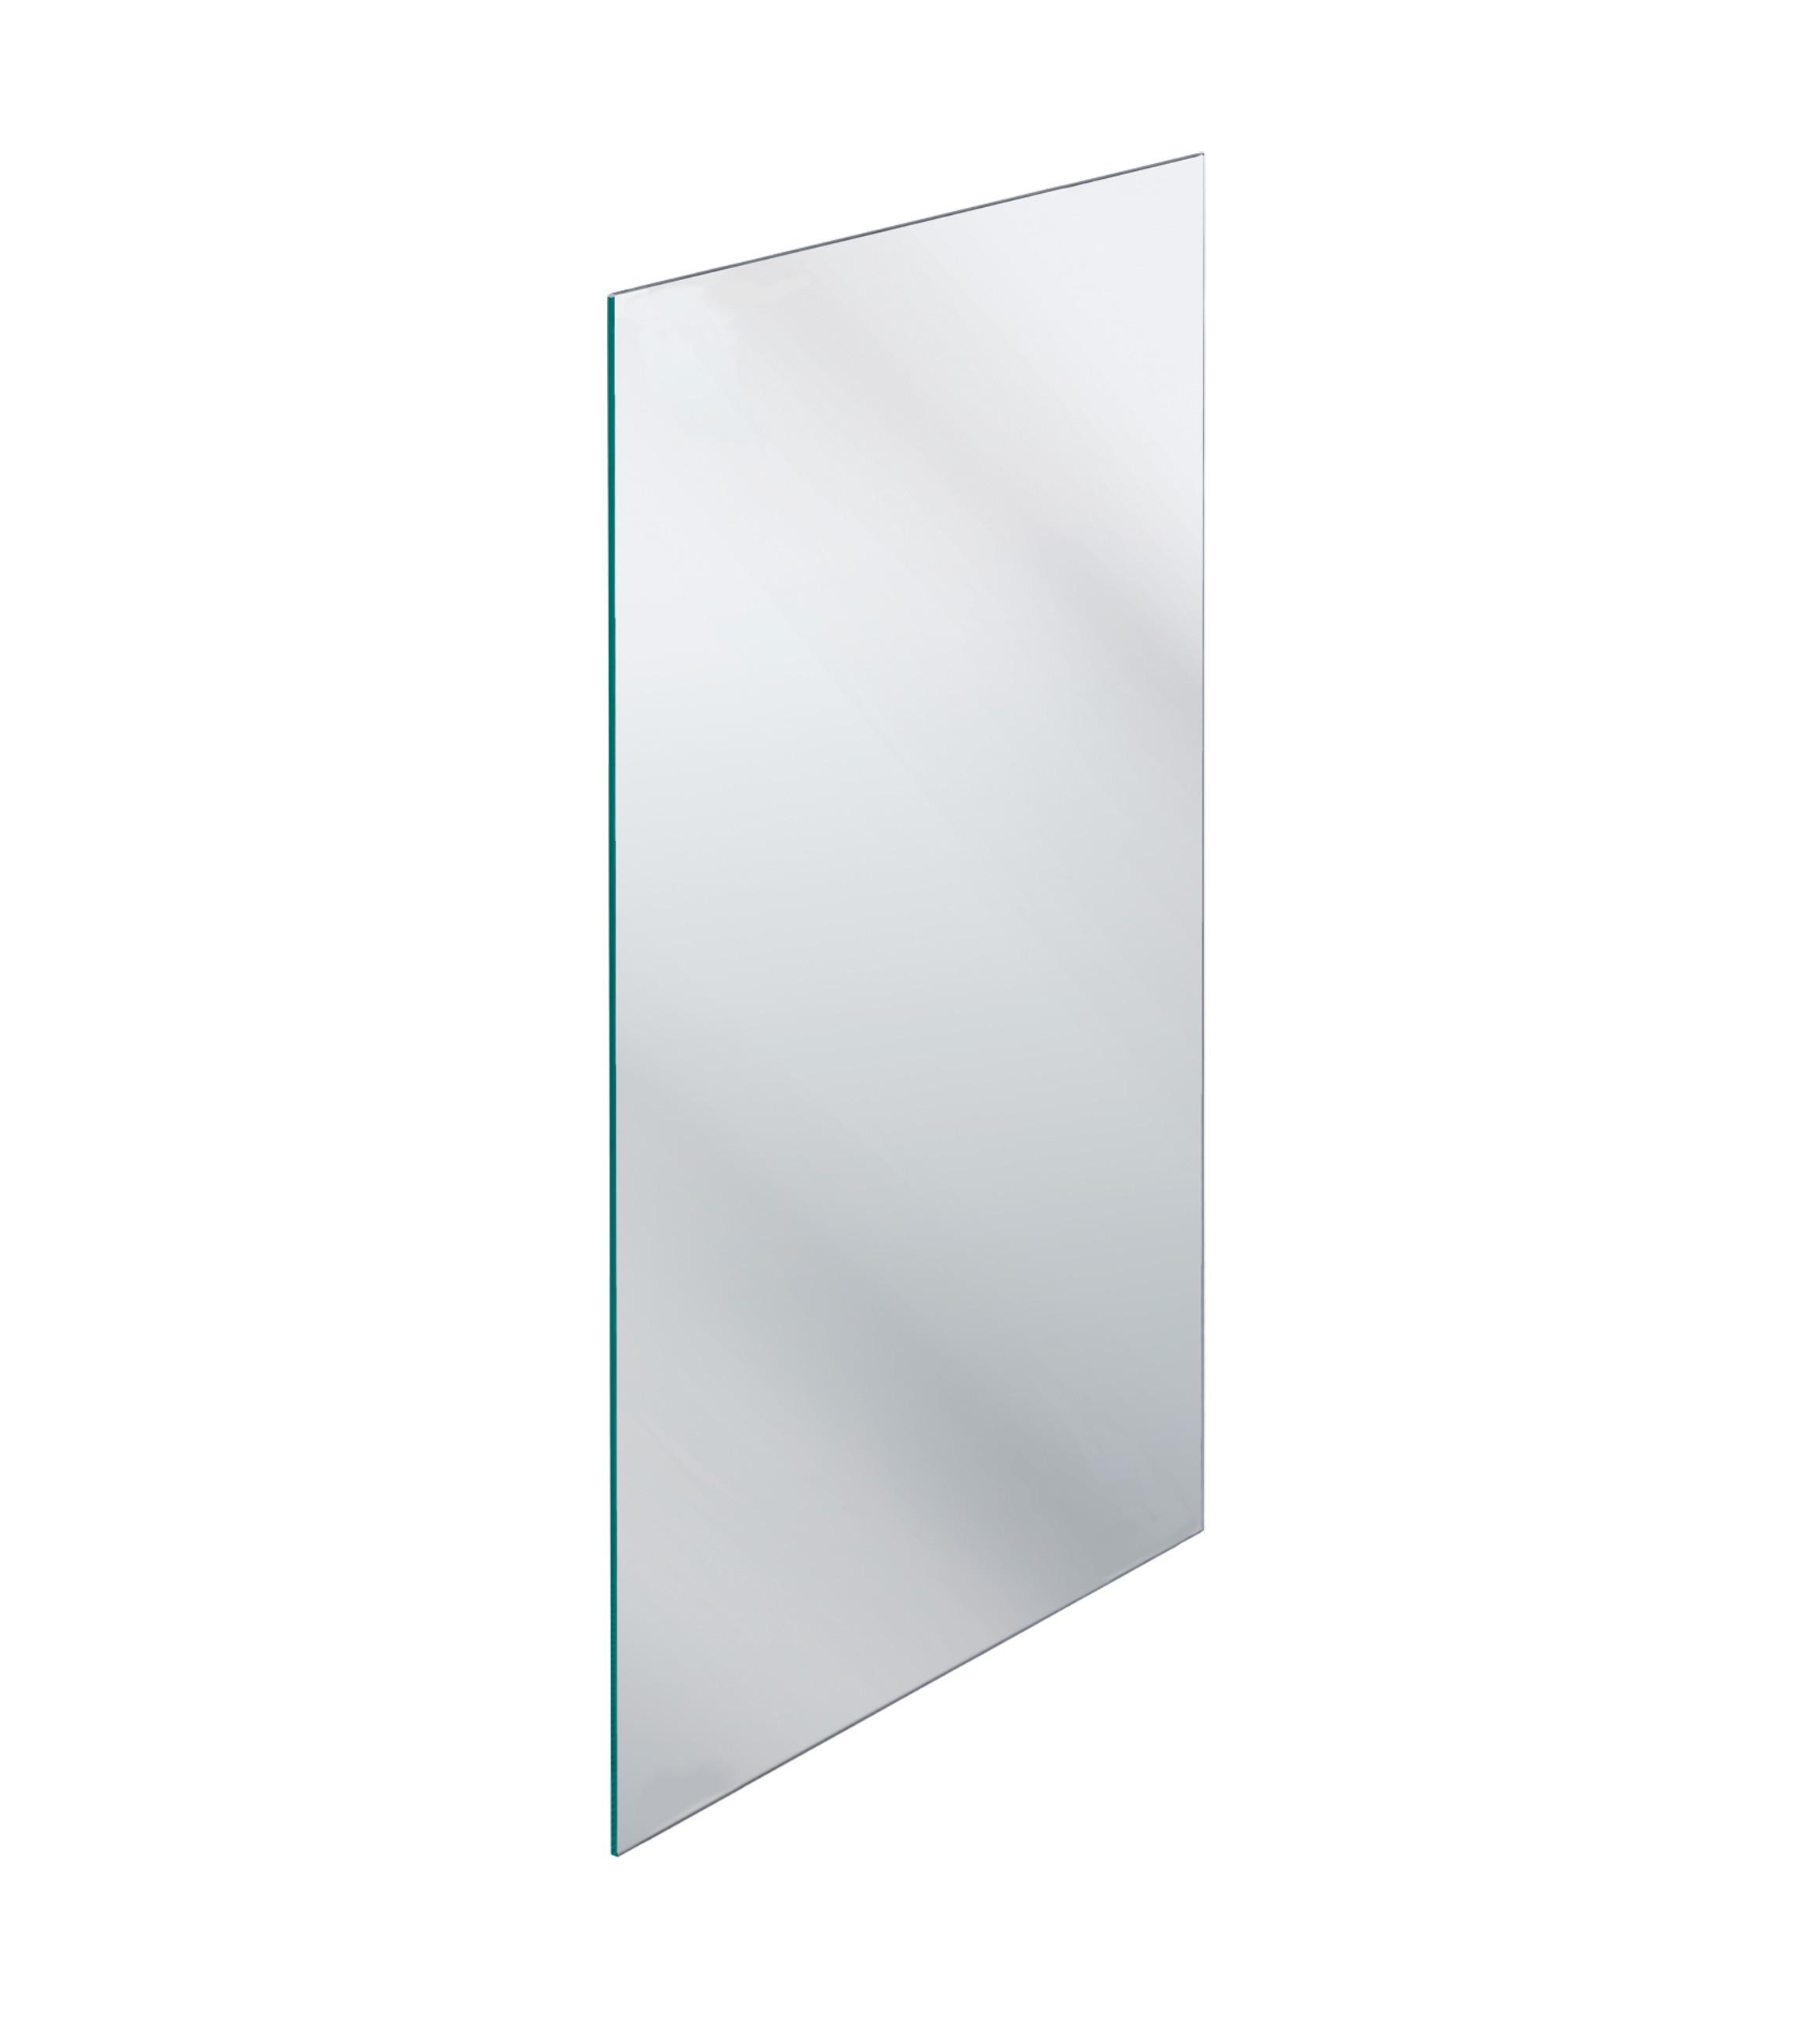 FSB Spiegel 600x450 Edelstahl spiegelpolinksert (0 82 8260 00056 6205)